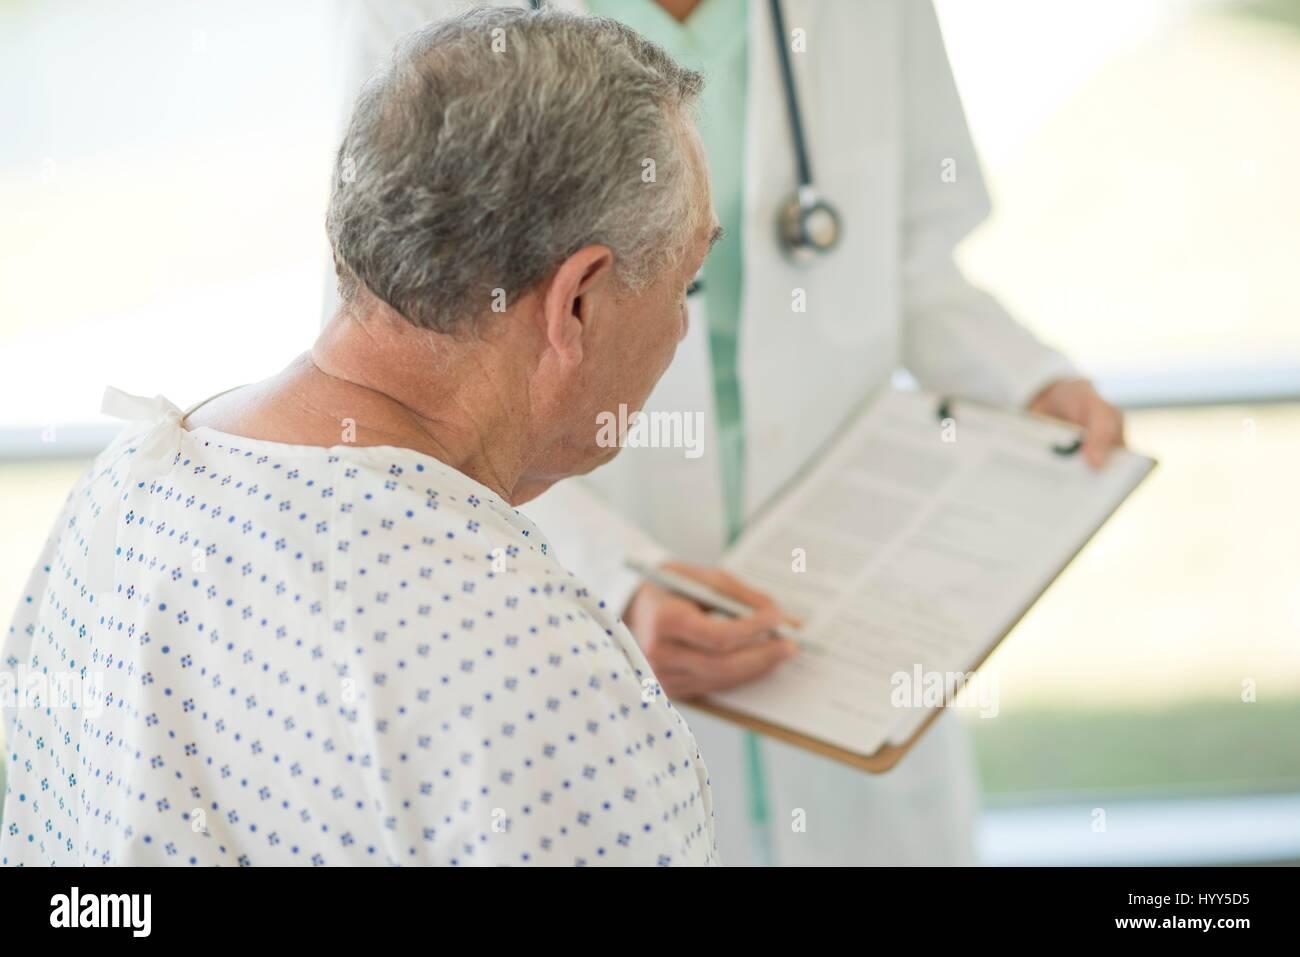 Senior man looking at medical notes in hospital. - Stock Image